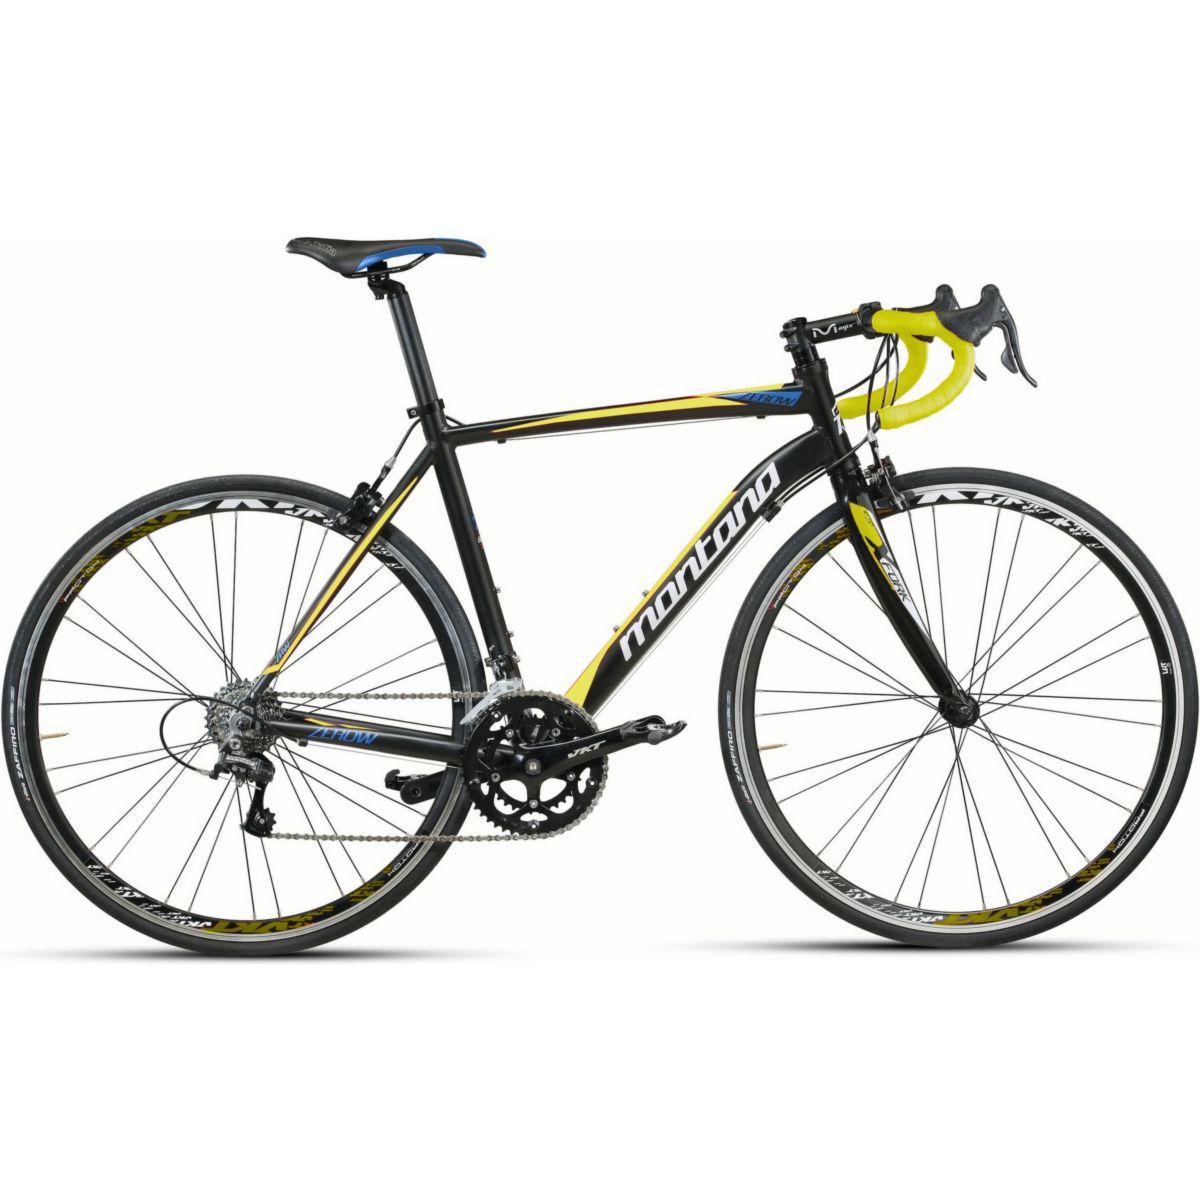 28 Zoll Montana Zerow Herren Rennrad Campagnolo 20 Gang Carbongabel schwarz-gelb, 58cm - broschei